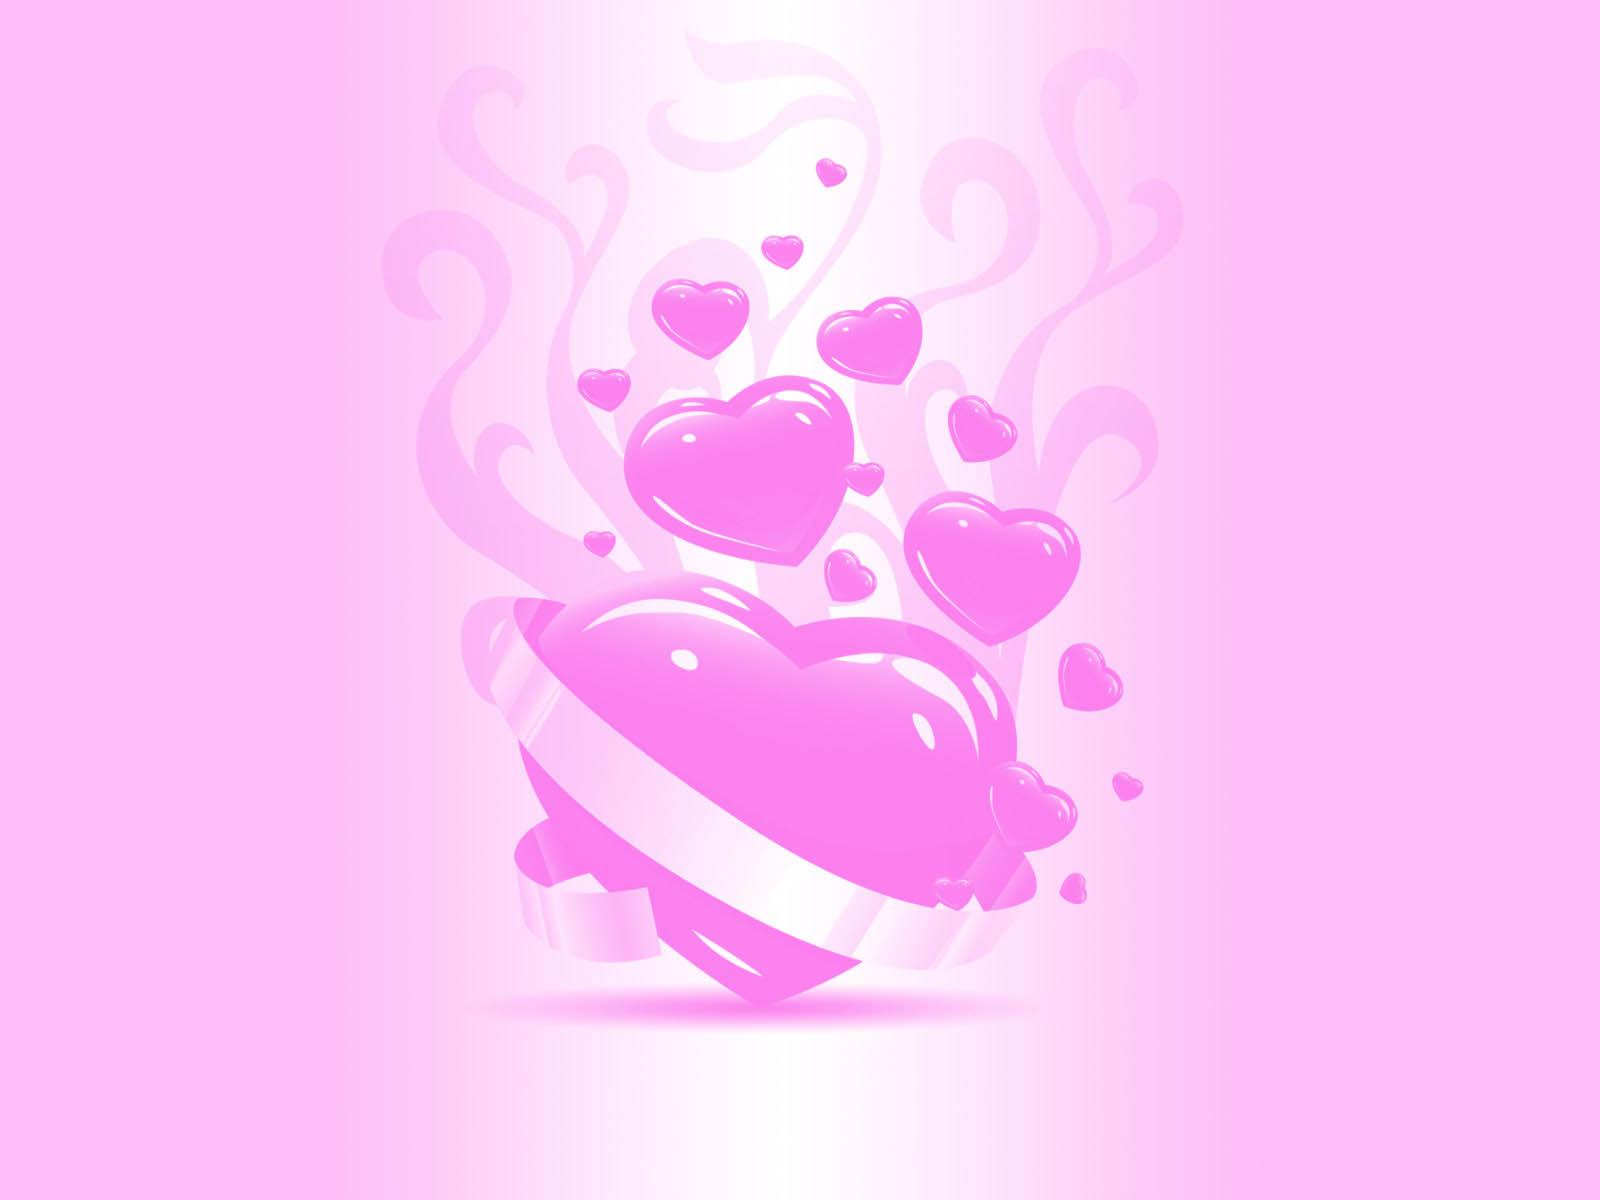 pink wallpapers abstract pink desktop wallpapers abstract pink desktop 1600x1200